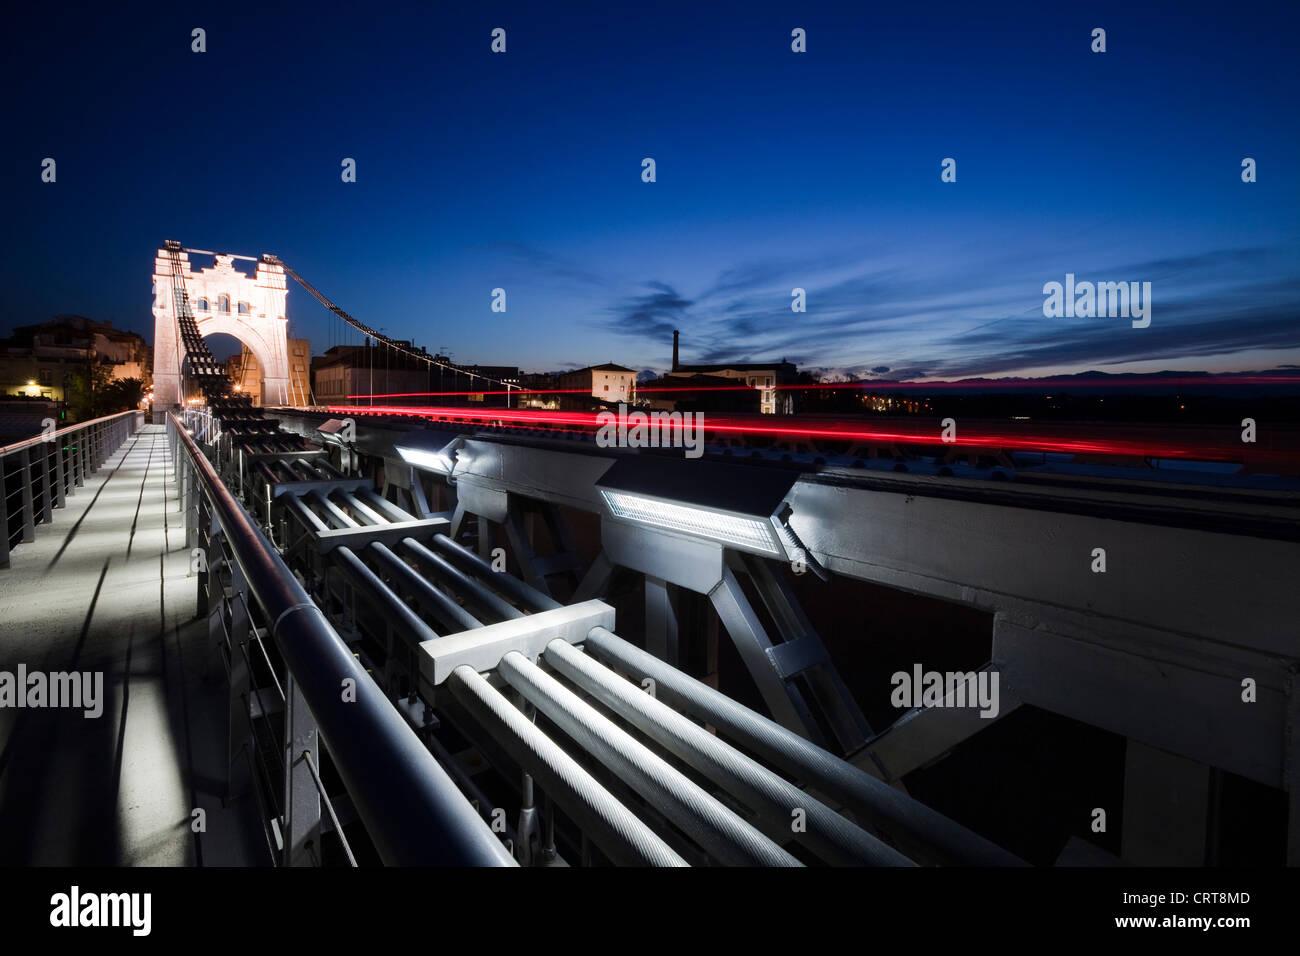 Amposta, Tarragona. Spain -31 Mar 2010- The suspension bridge over the Ebro river at dusk Stock Photo